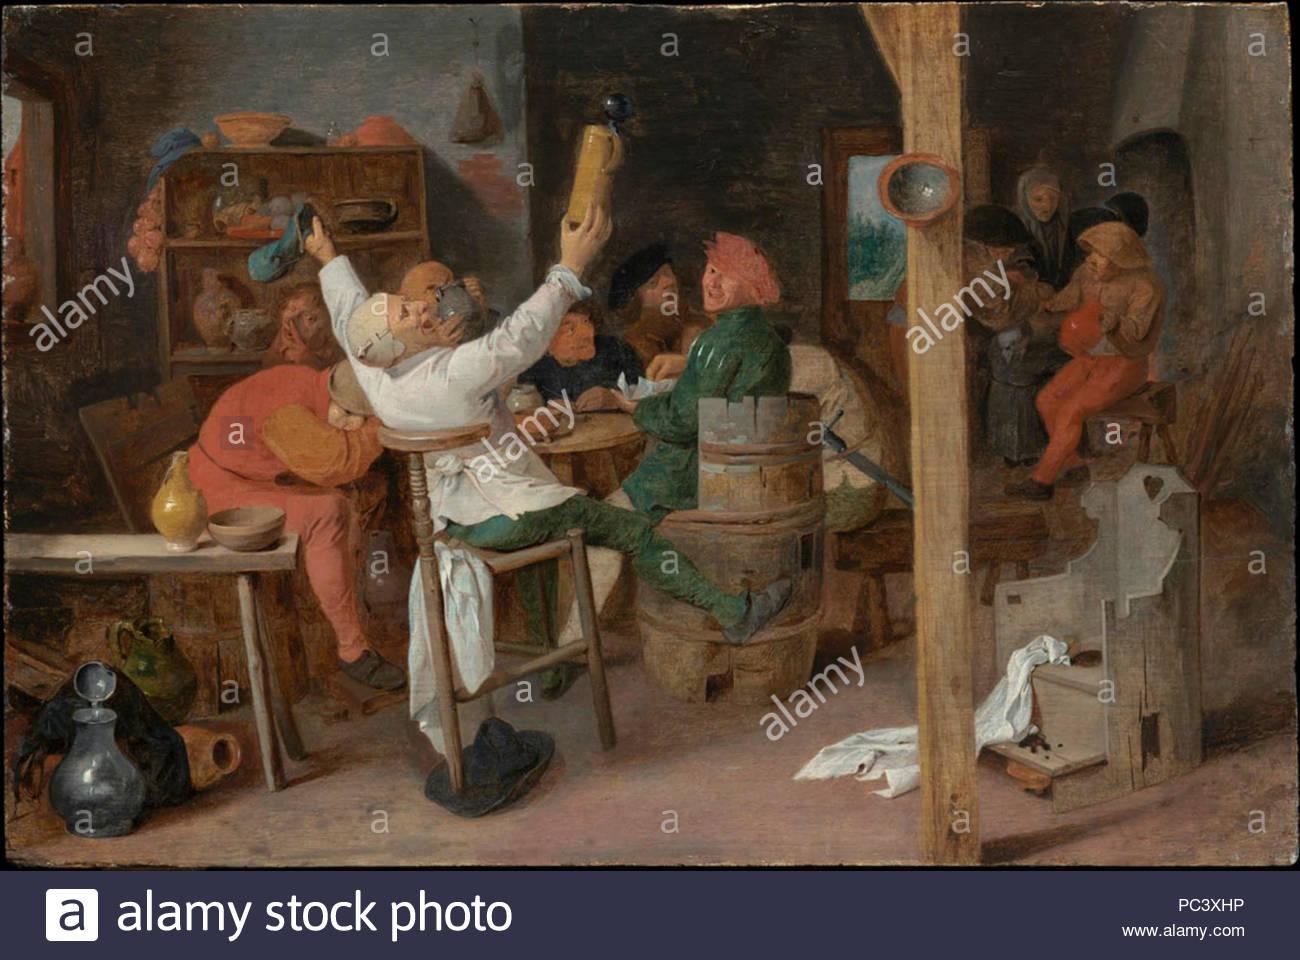 Adriaen Brouwer - Carousing Campesinos en una taberna.